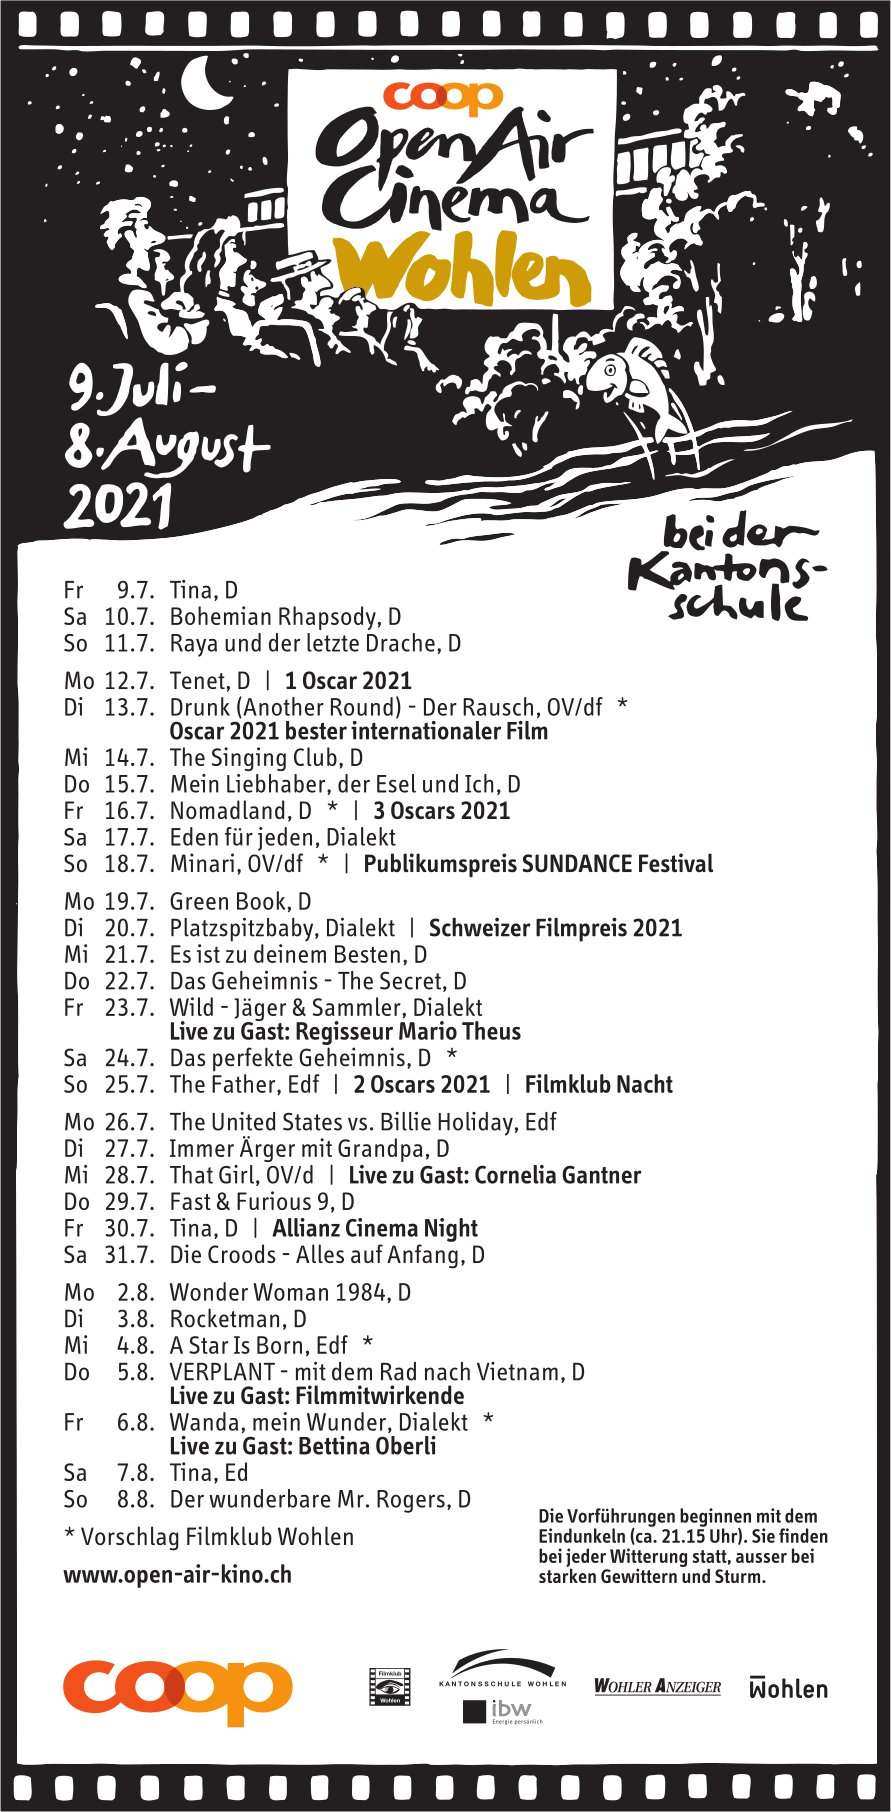 OpenAir Cinéma, 9. Juli bis 8. August, bei der Kantonsschule